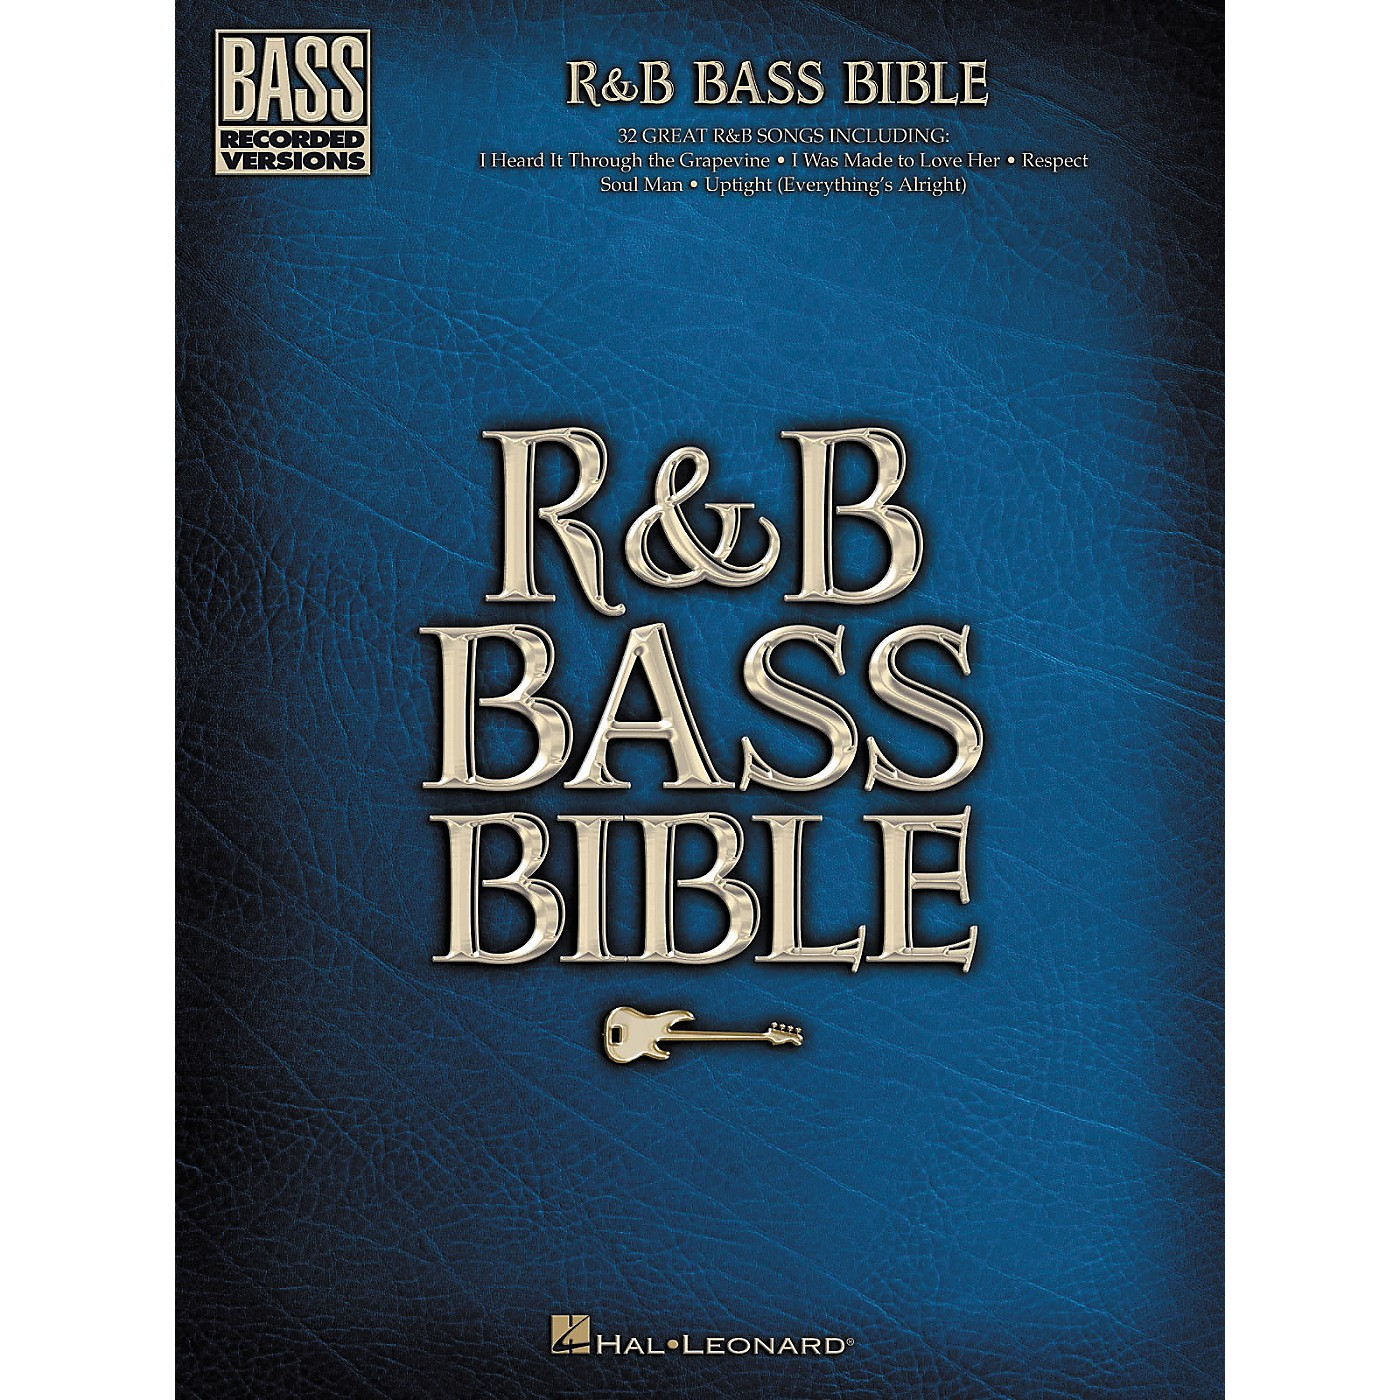 Hal Leonard R & B Bible Bass Guitar Tab Songbook thumbnail